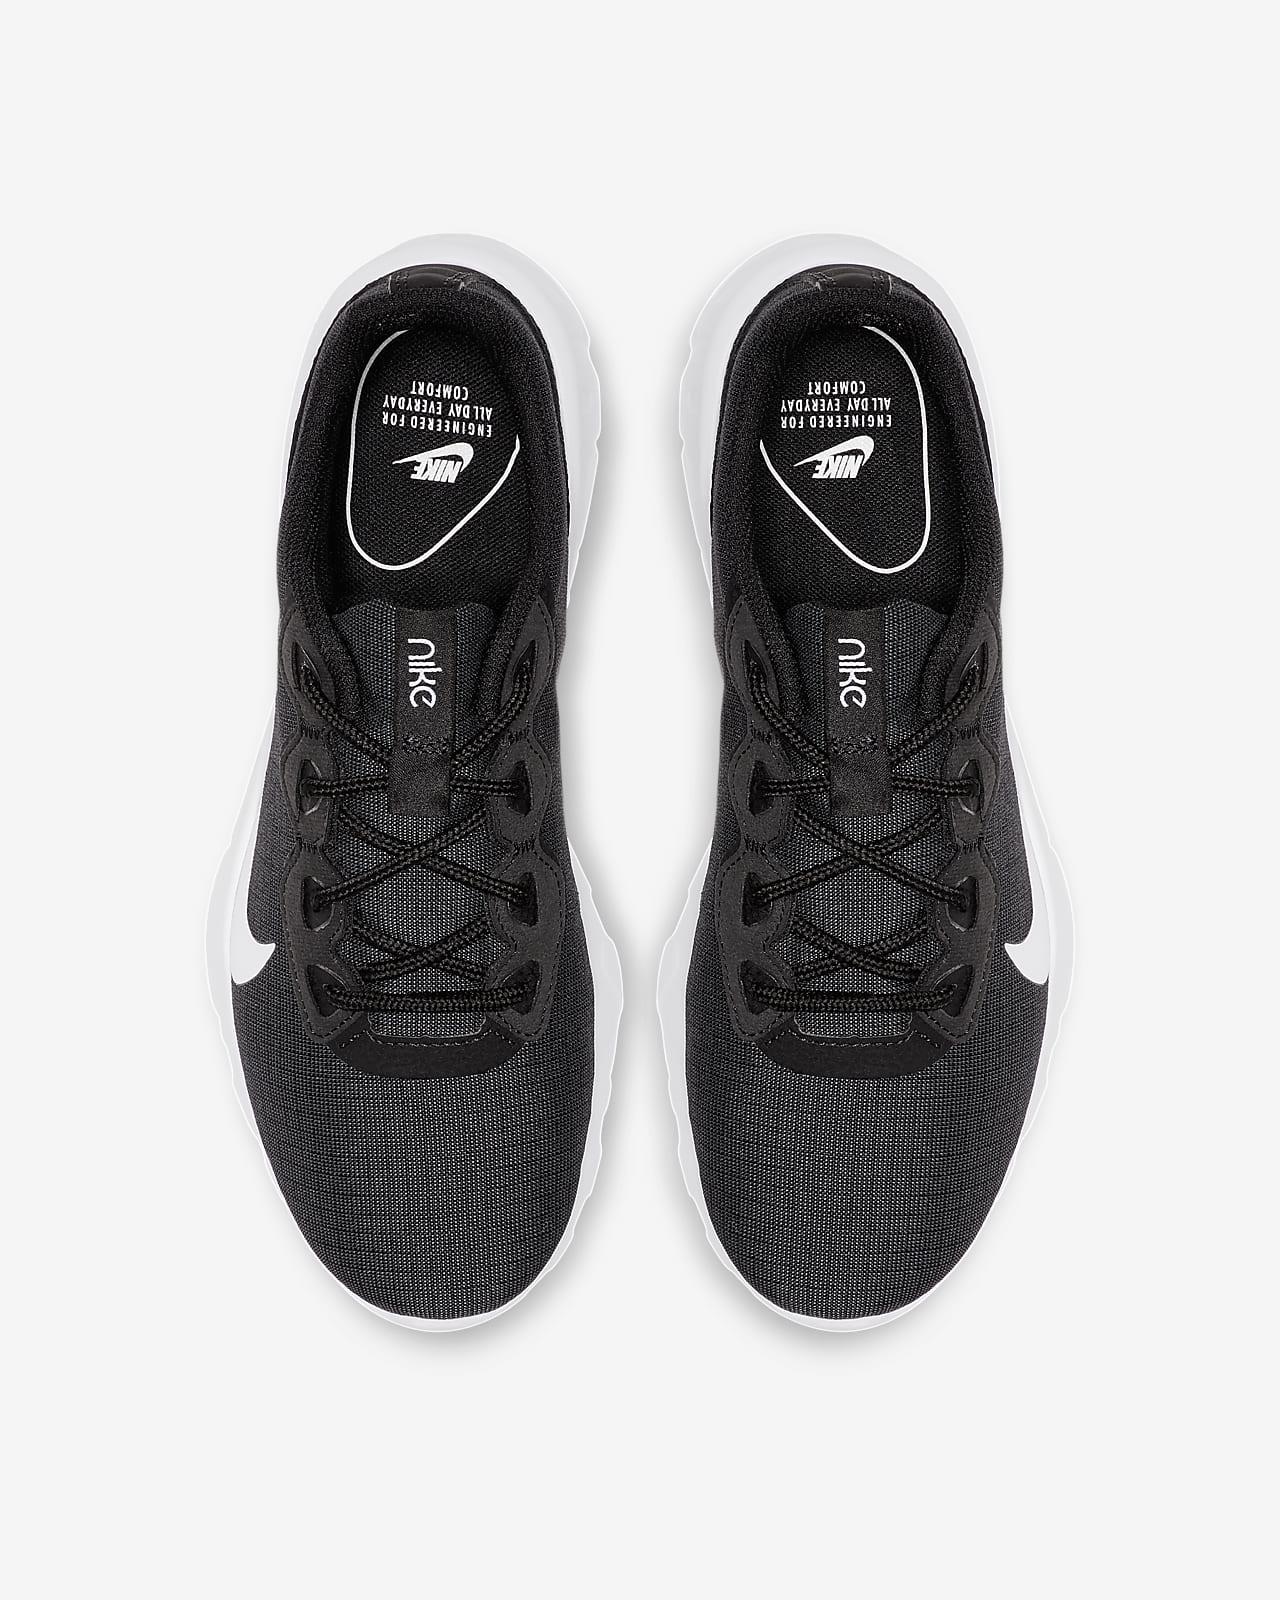 Nike Explore Strada Women's Shoe. Nike SG